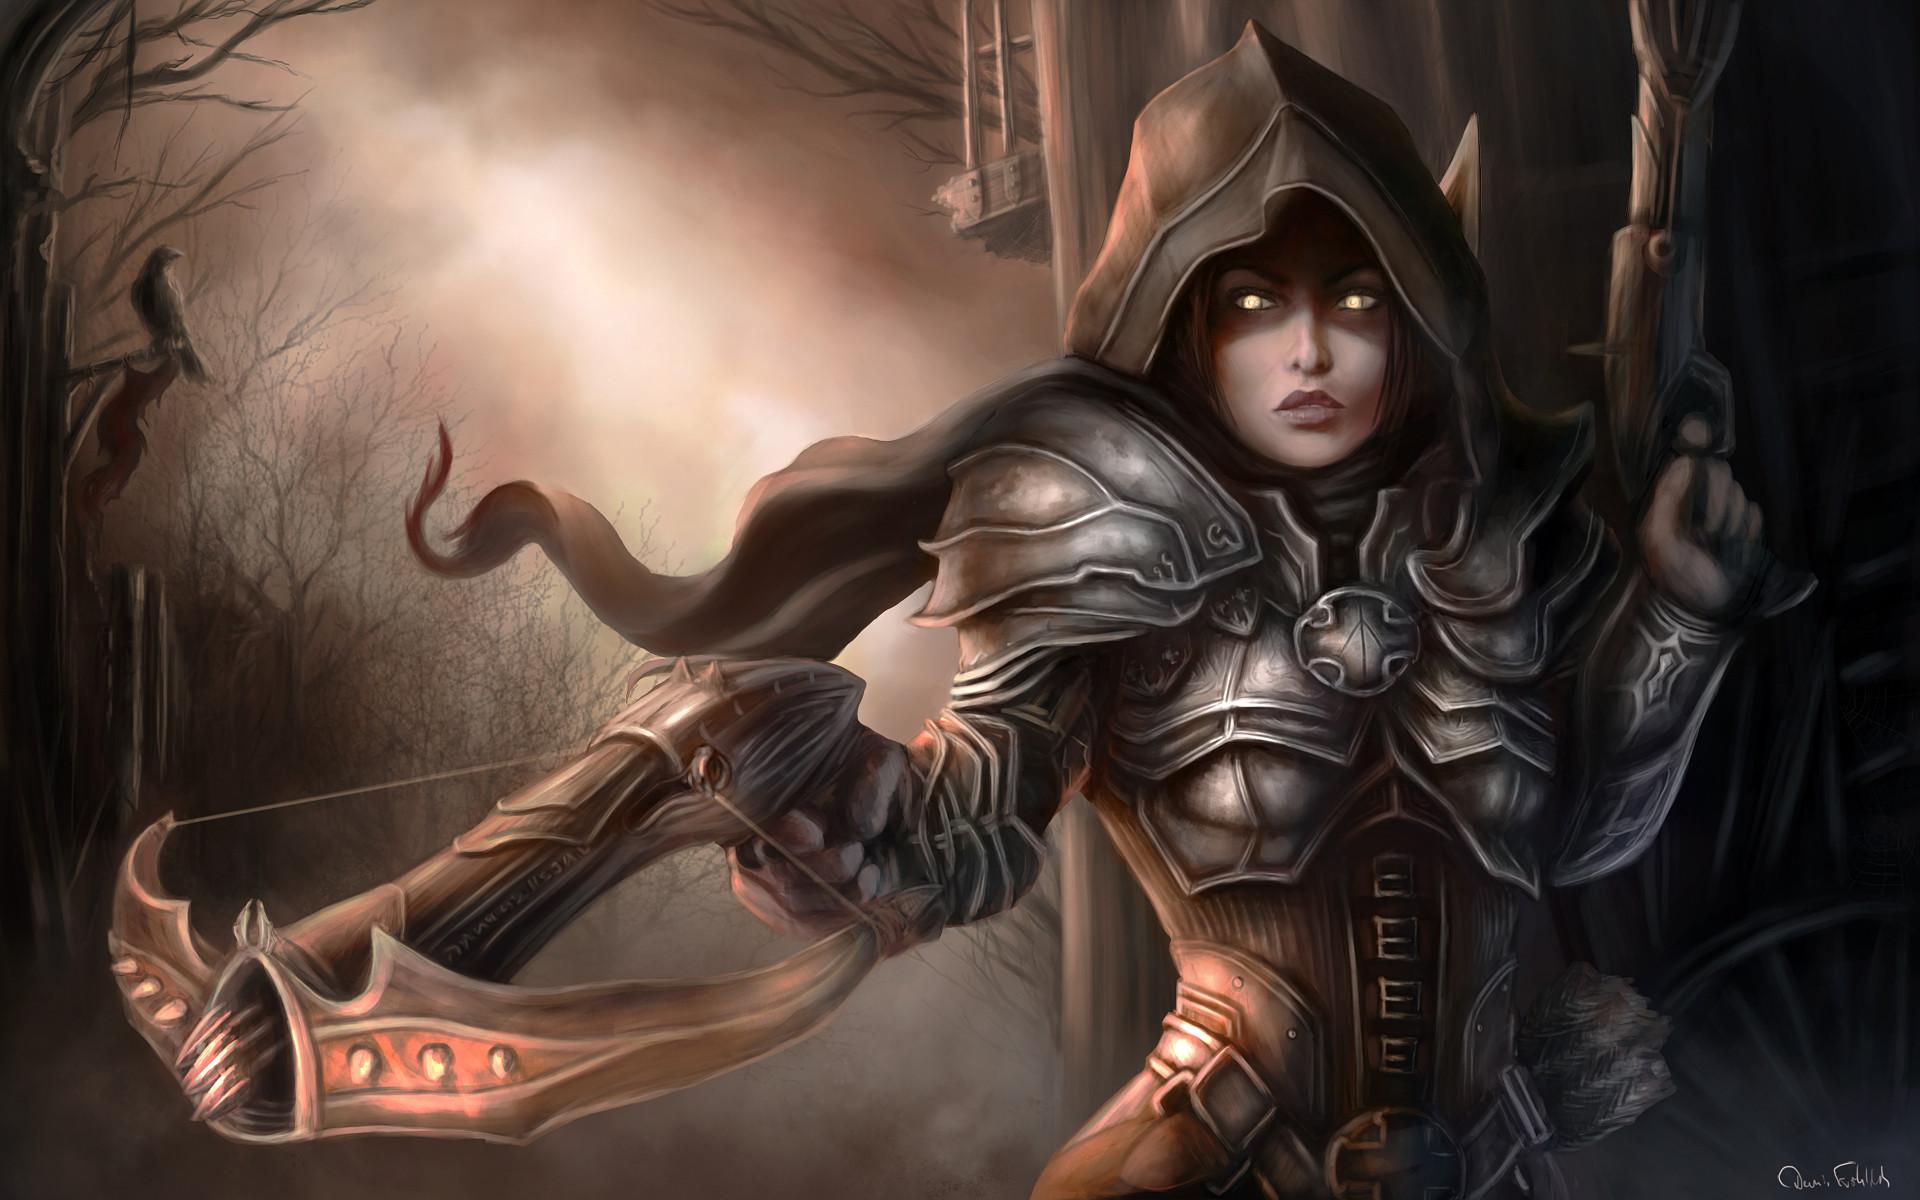 Demon Hunter Character Diablo Reaper of Souls Wallpaper